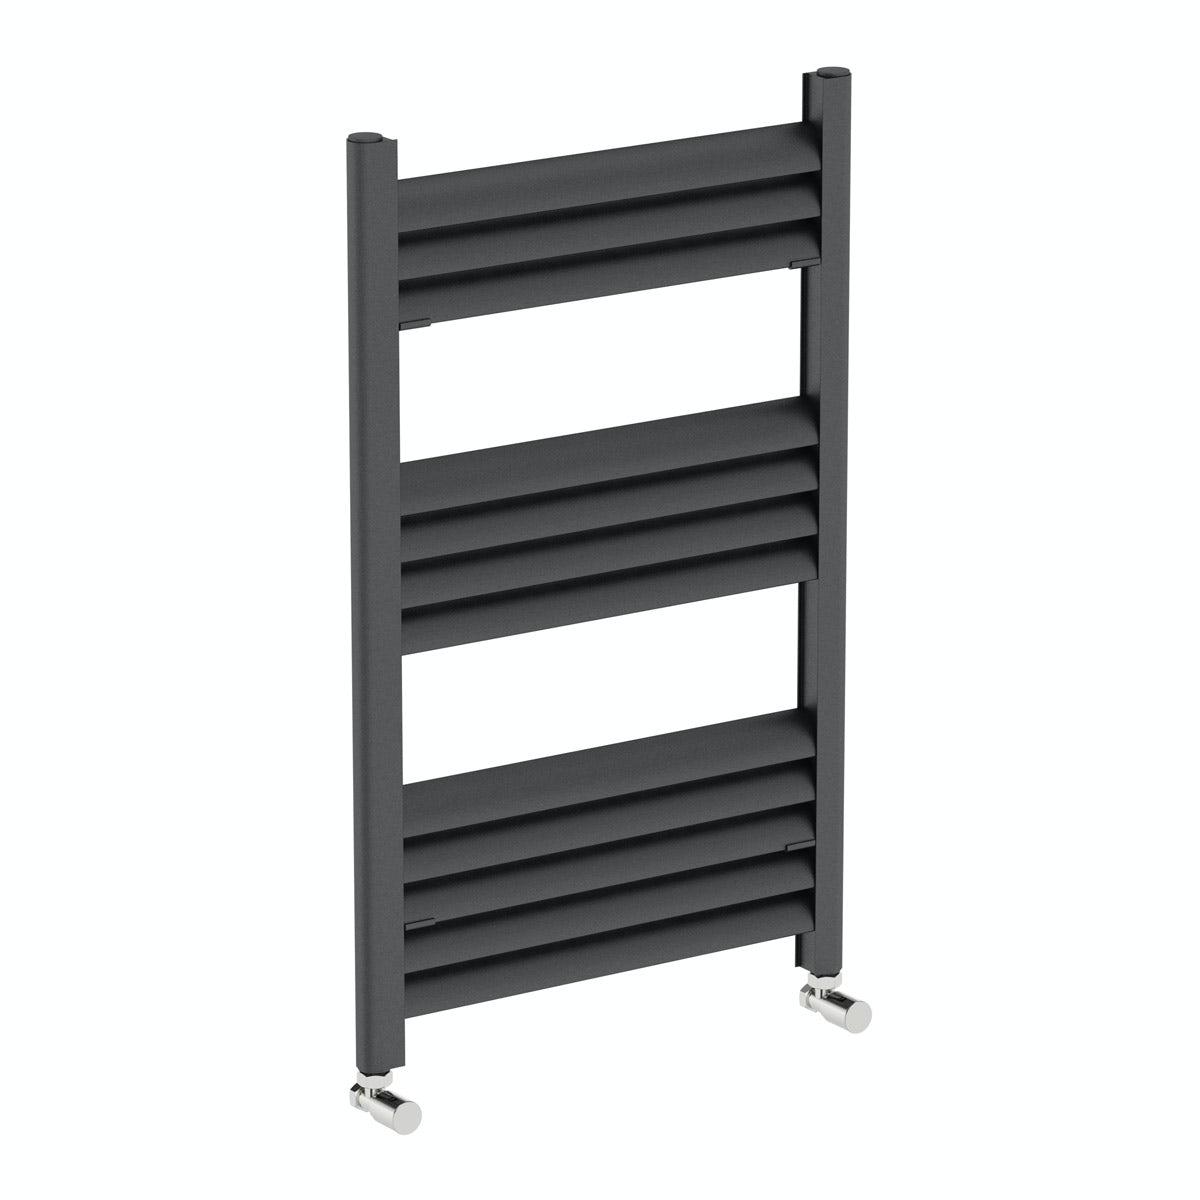 Mode Carter charcoal black heated towel rail 800 x 500